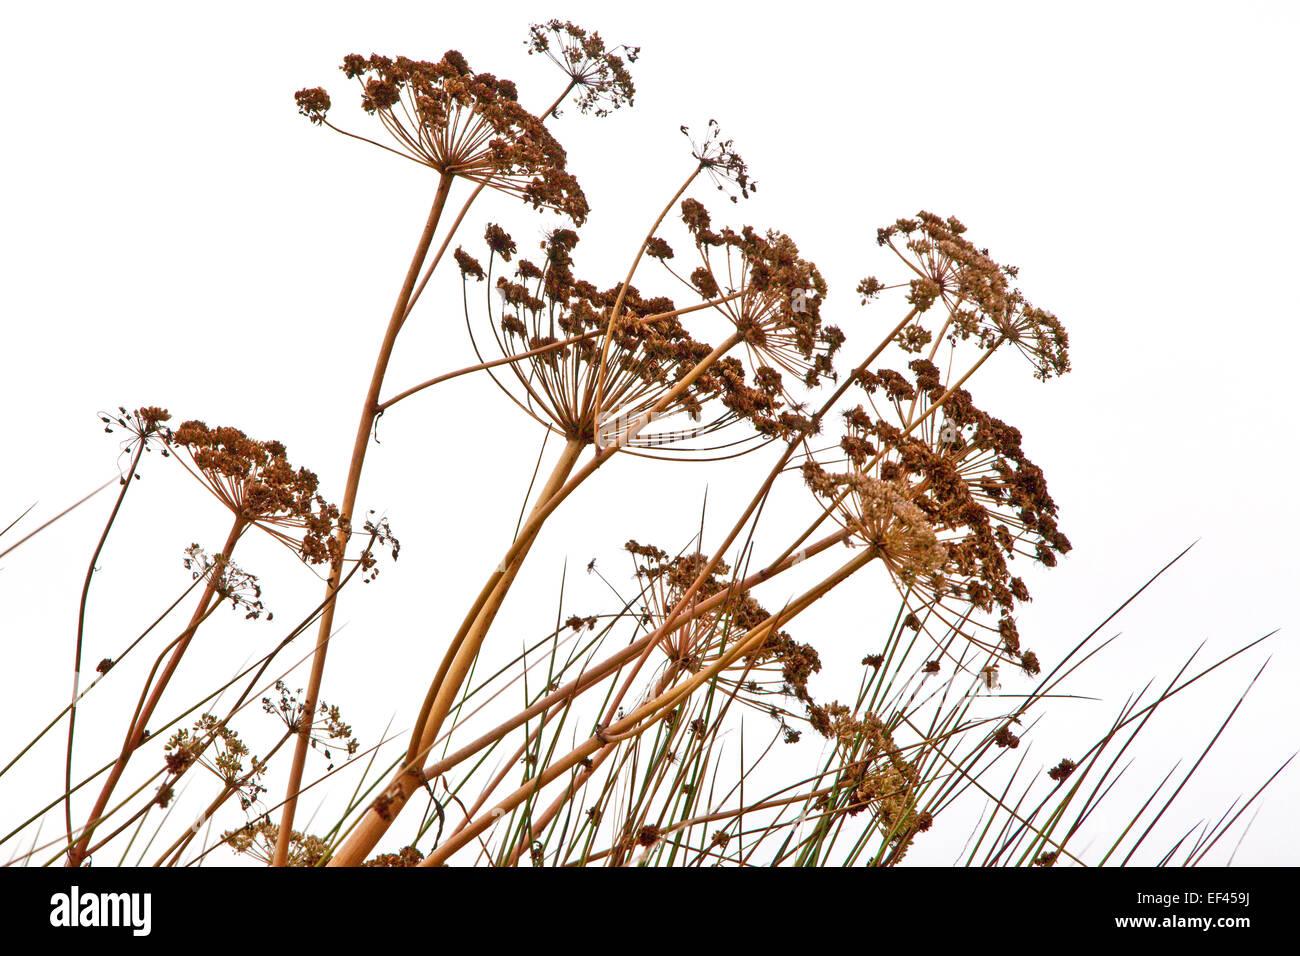 Autumnal Wild Plants - Stock Image